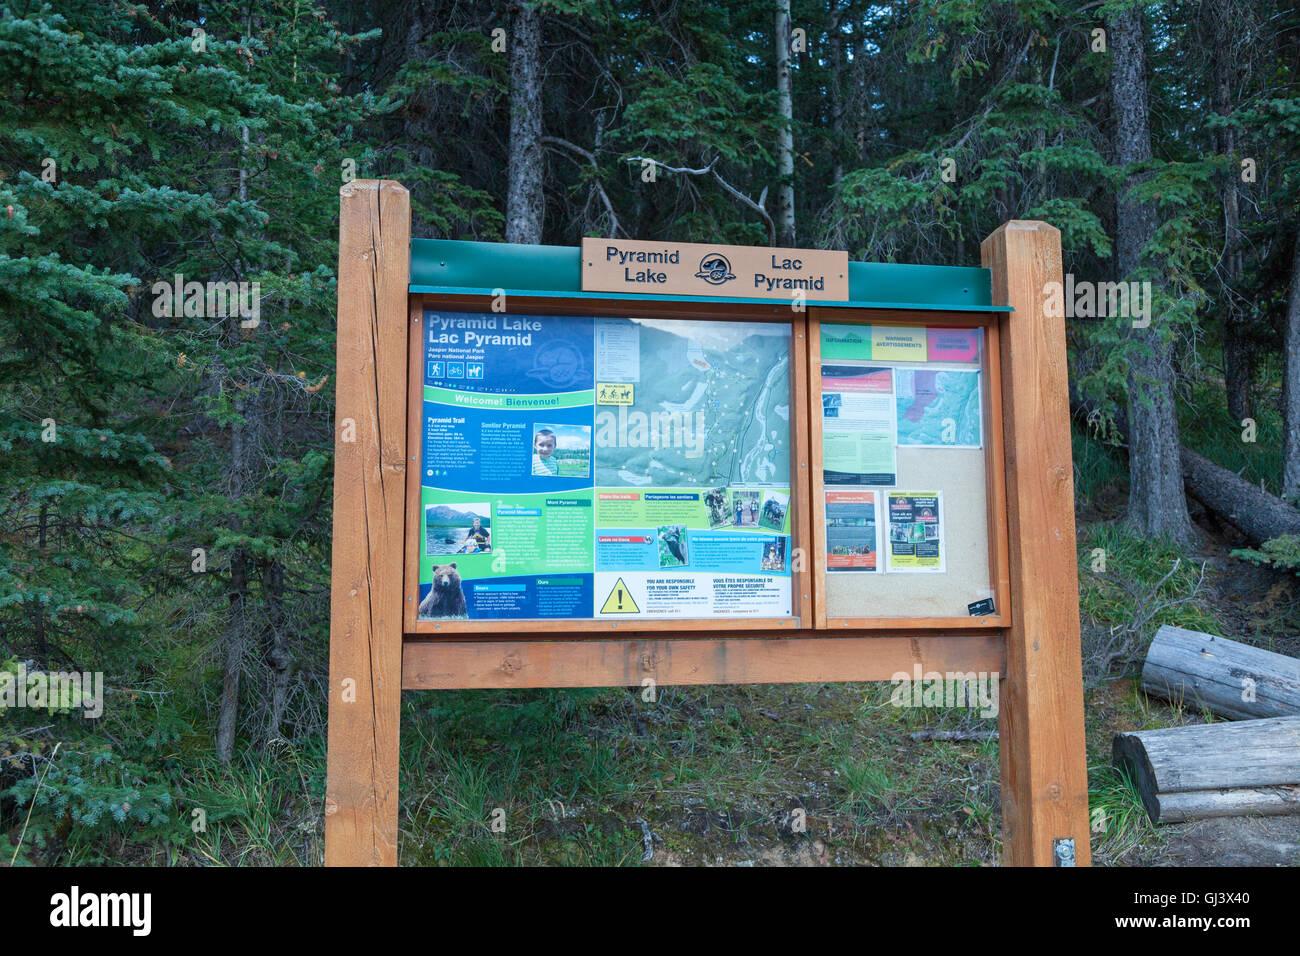 A noticeboard for Pyramid Lake in Jasper National Park, Alberta, Canada - Stock Image